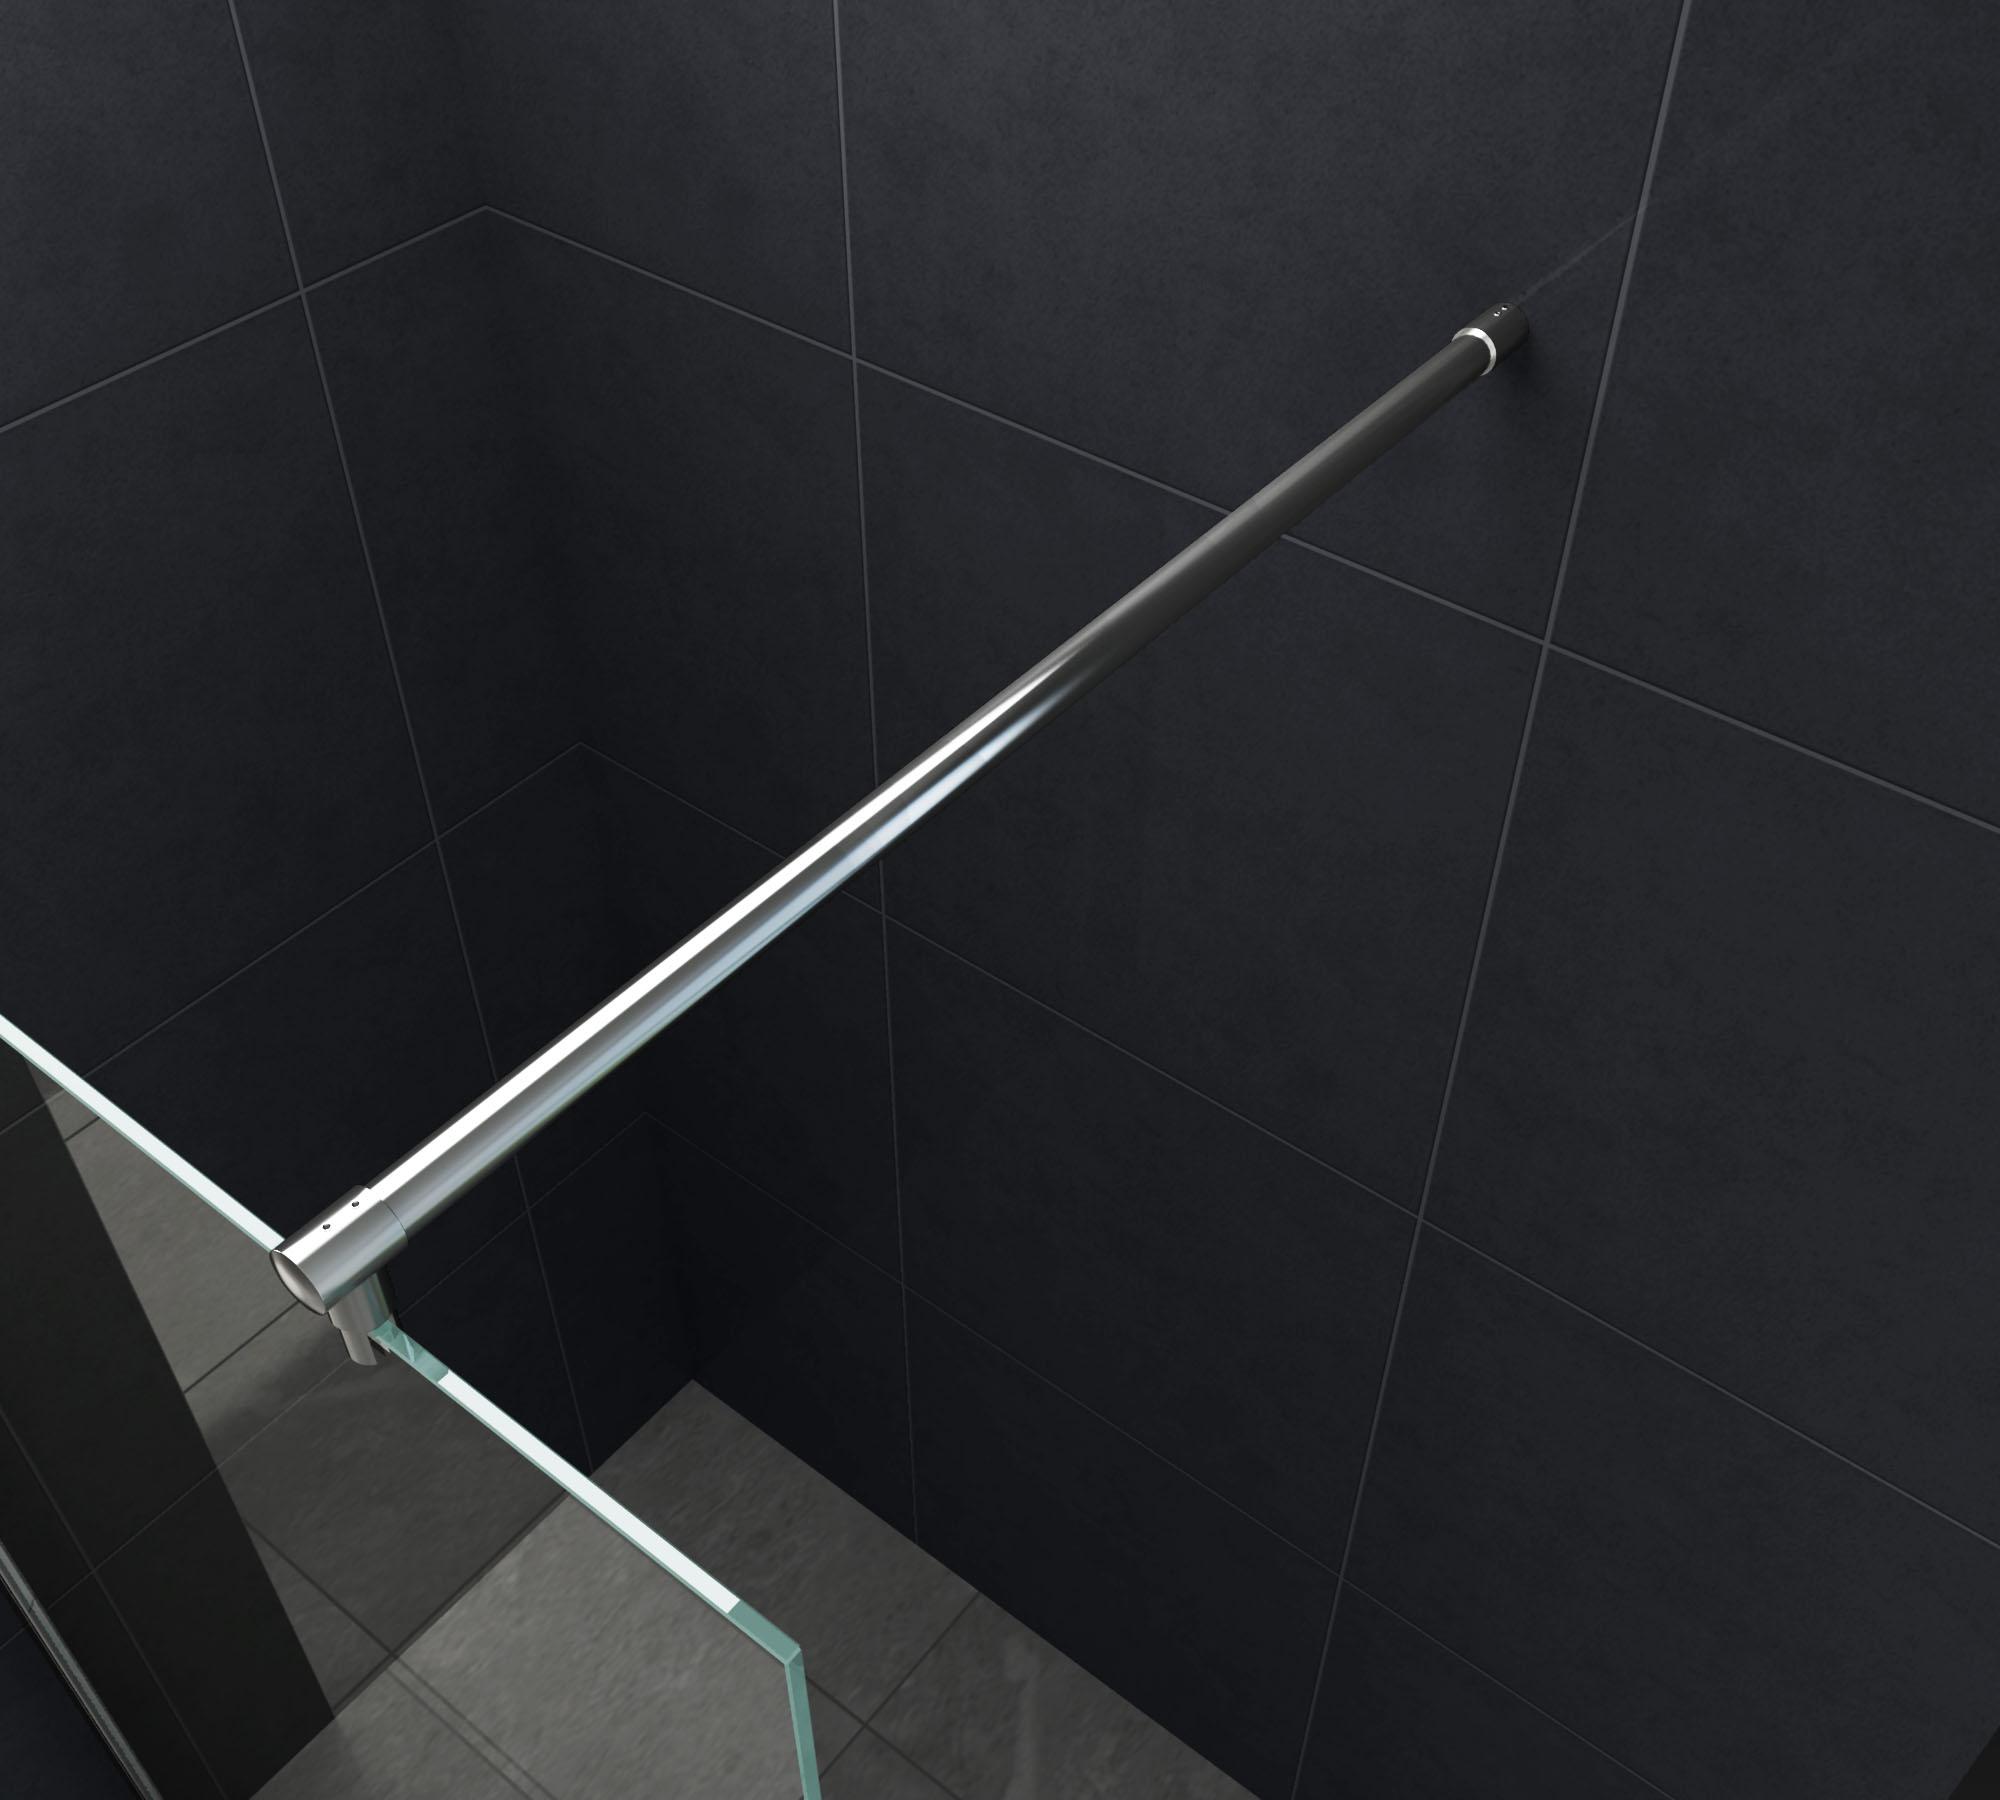 10 mm duschwand slim 120 x 200 cm glasdeals. Black Bedroom Furniture Sets. Home Design Ideas